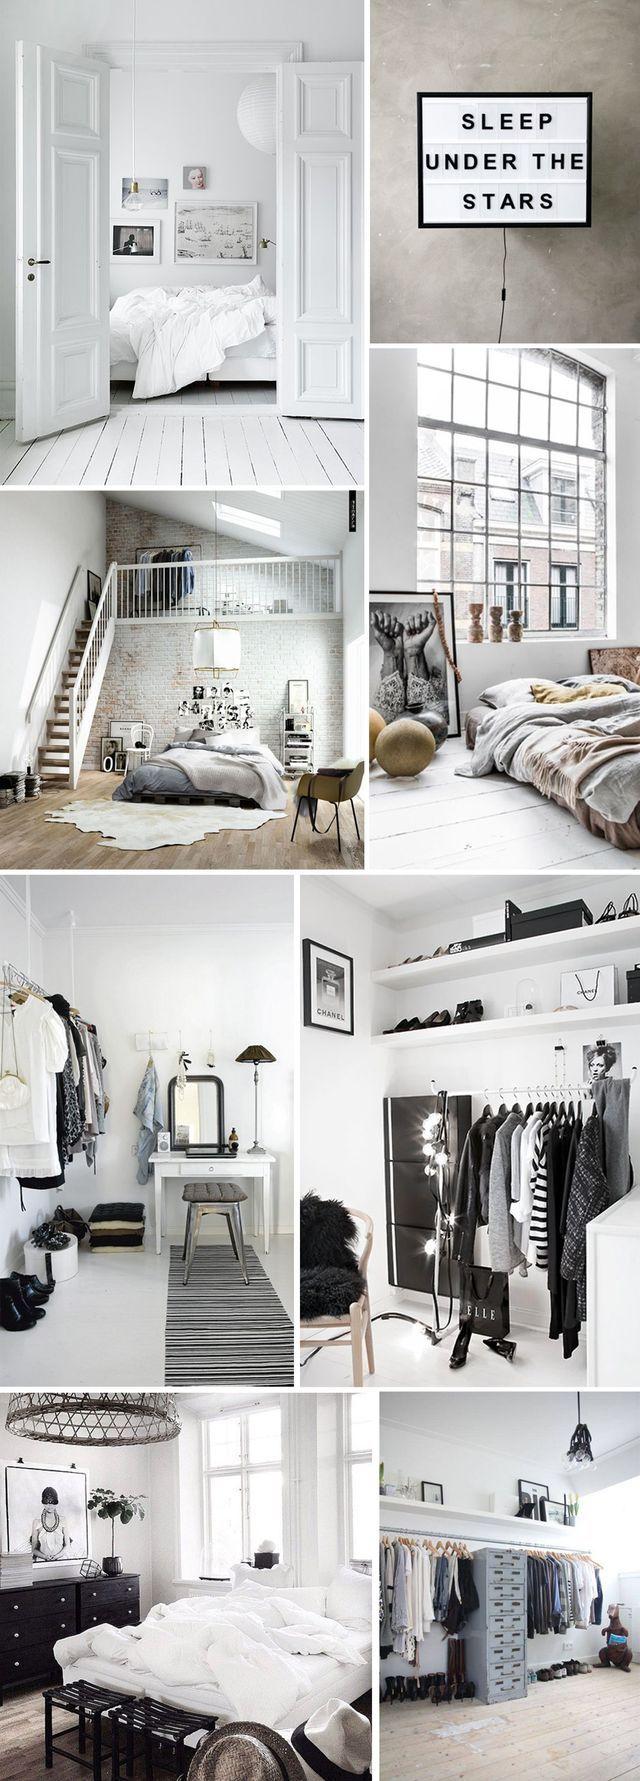 Schlafzimmer Inspirationen | bedroom inspirations